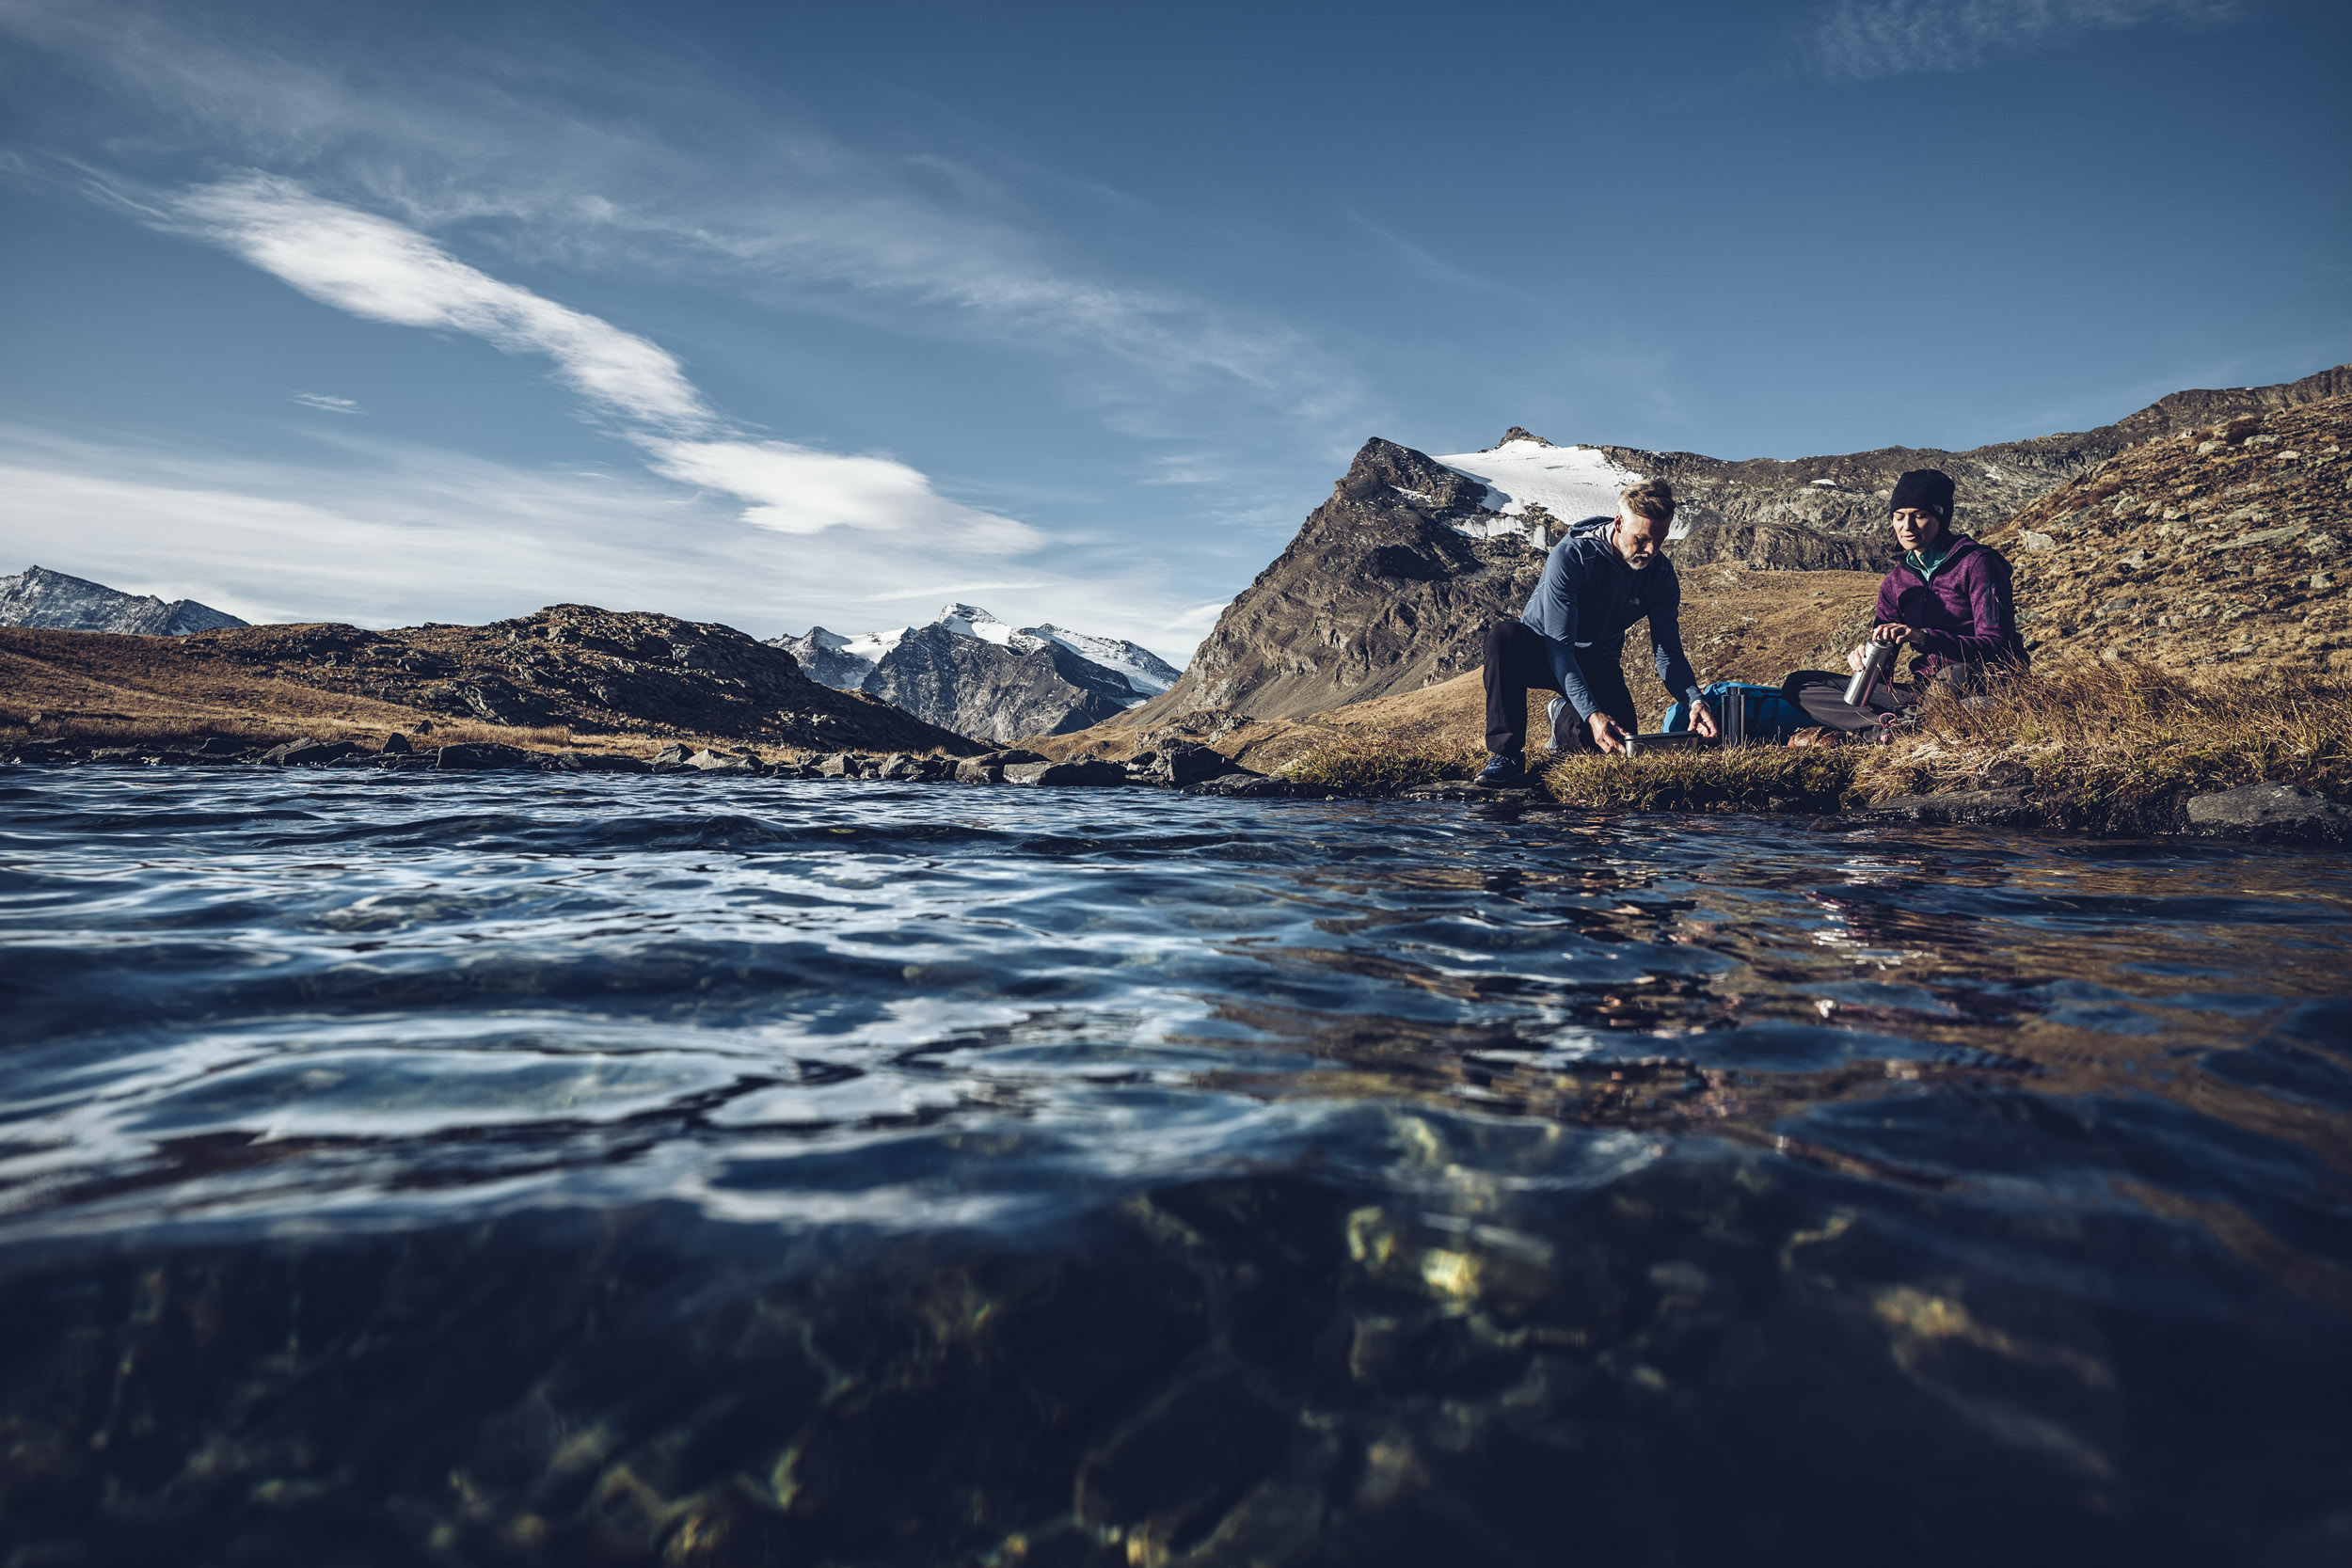 2019-SeifertUebler-luqel-outdoor-mountain-lifestyle002.jpg